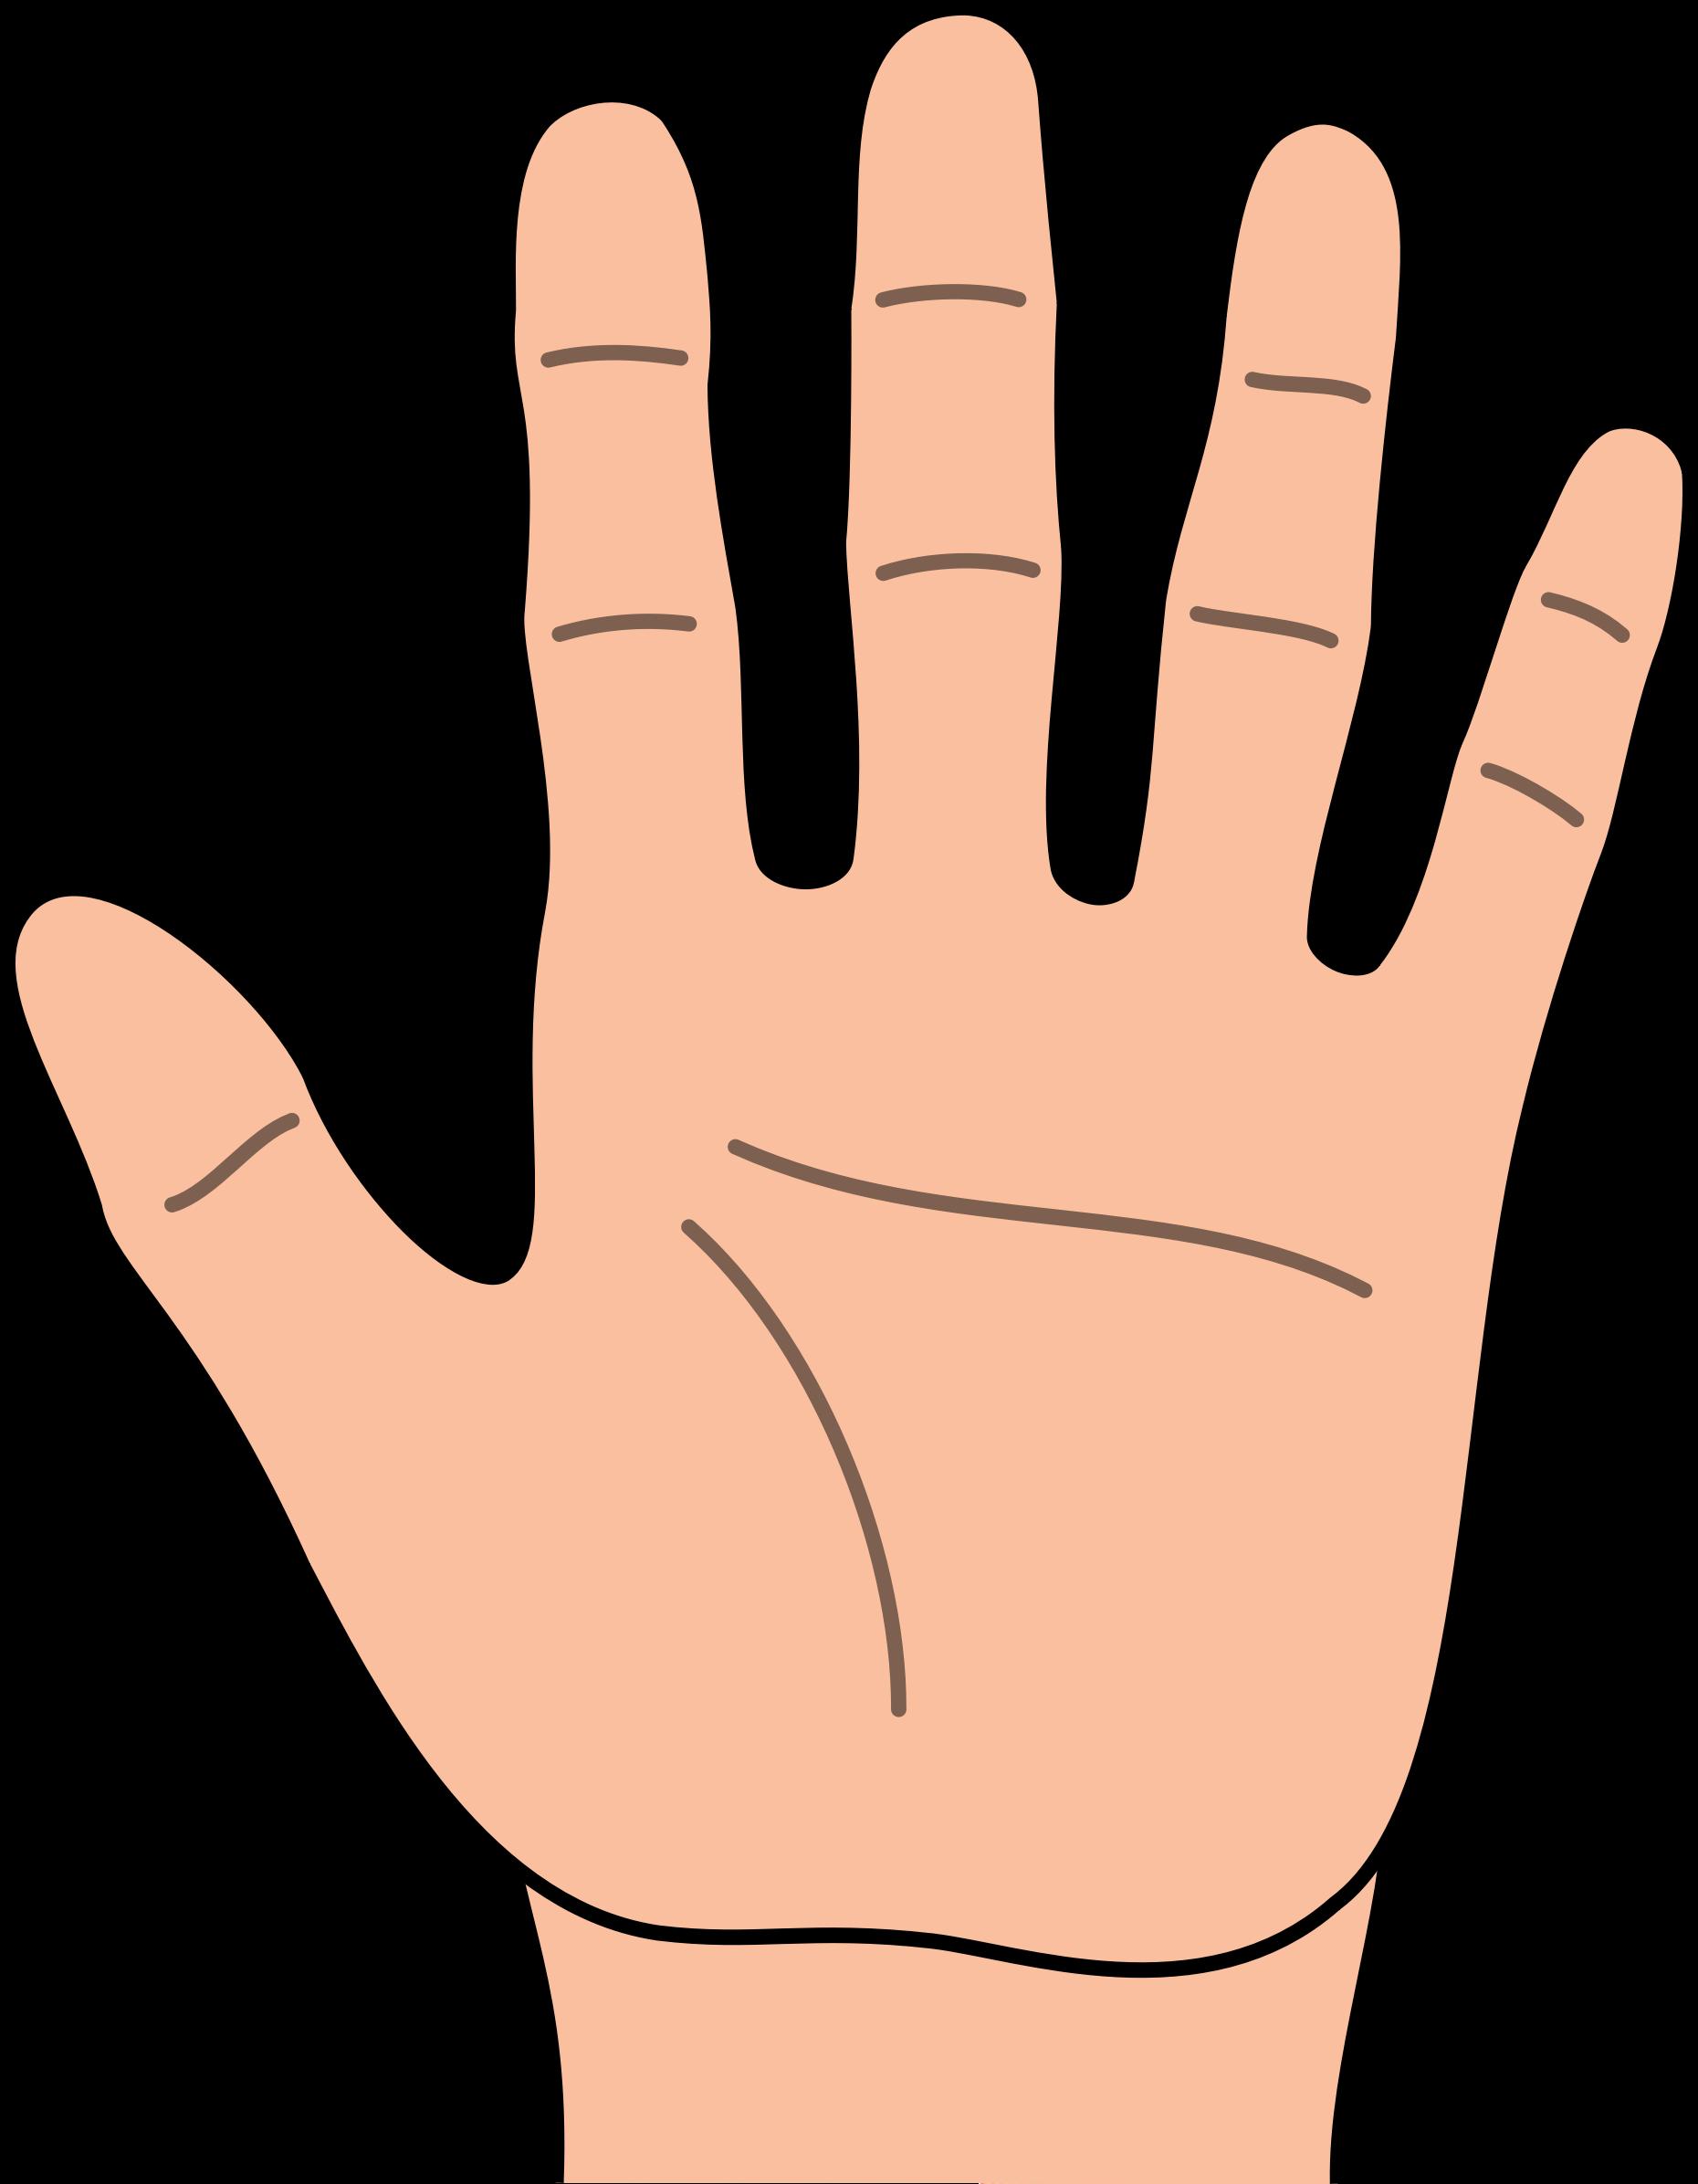 Hands Hand Clip Art Free Clipart Images-Hands hand clip art free clipart images-16